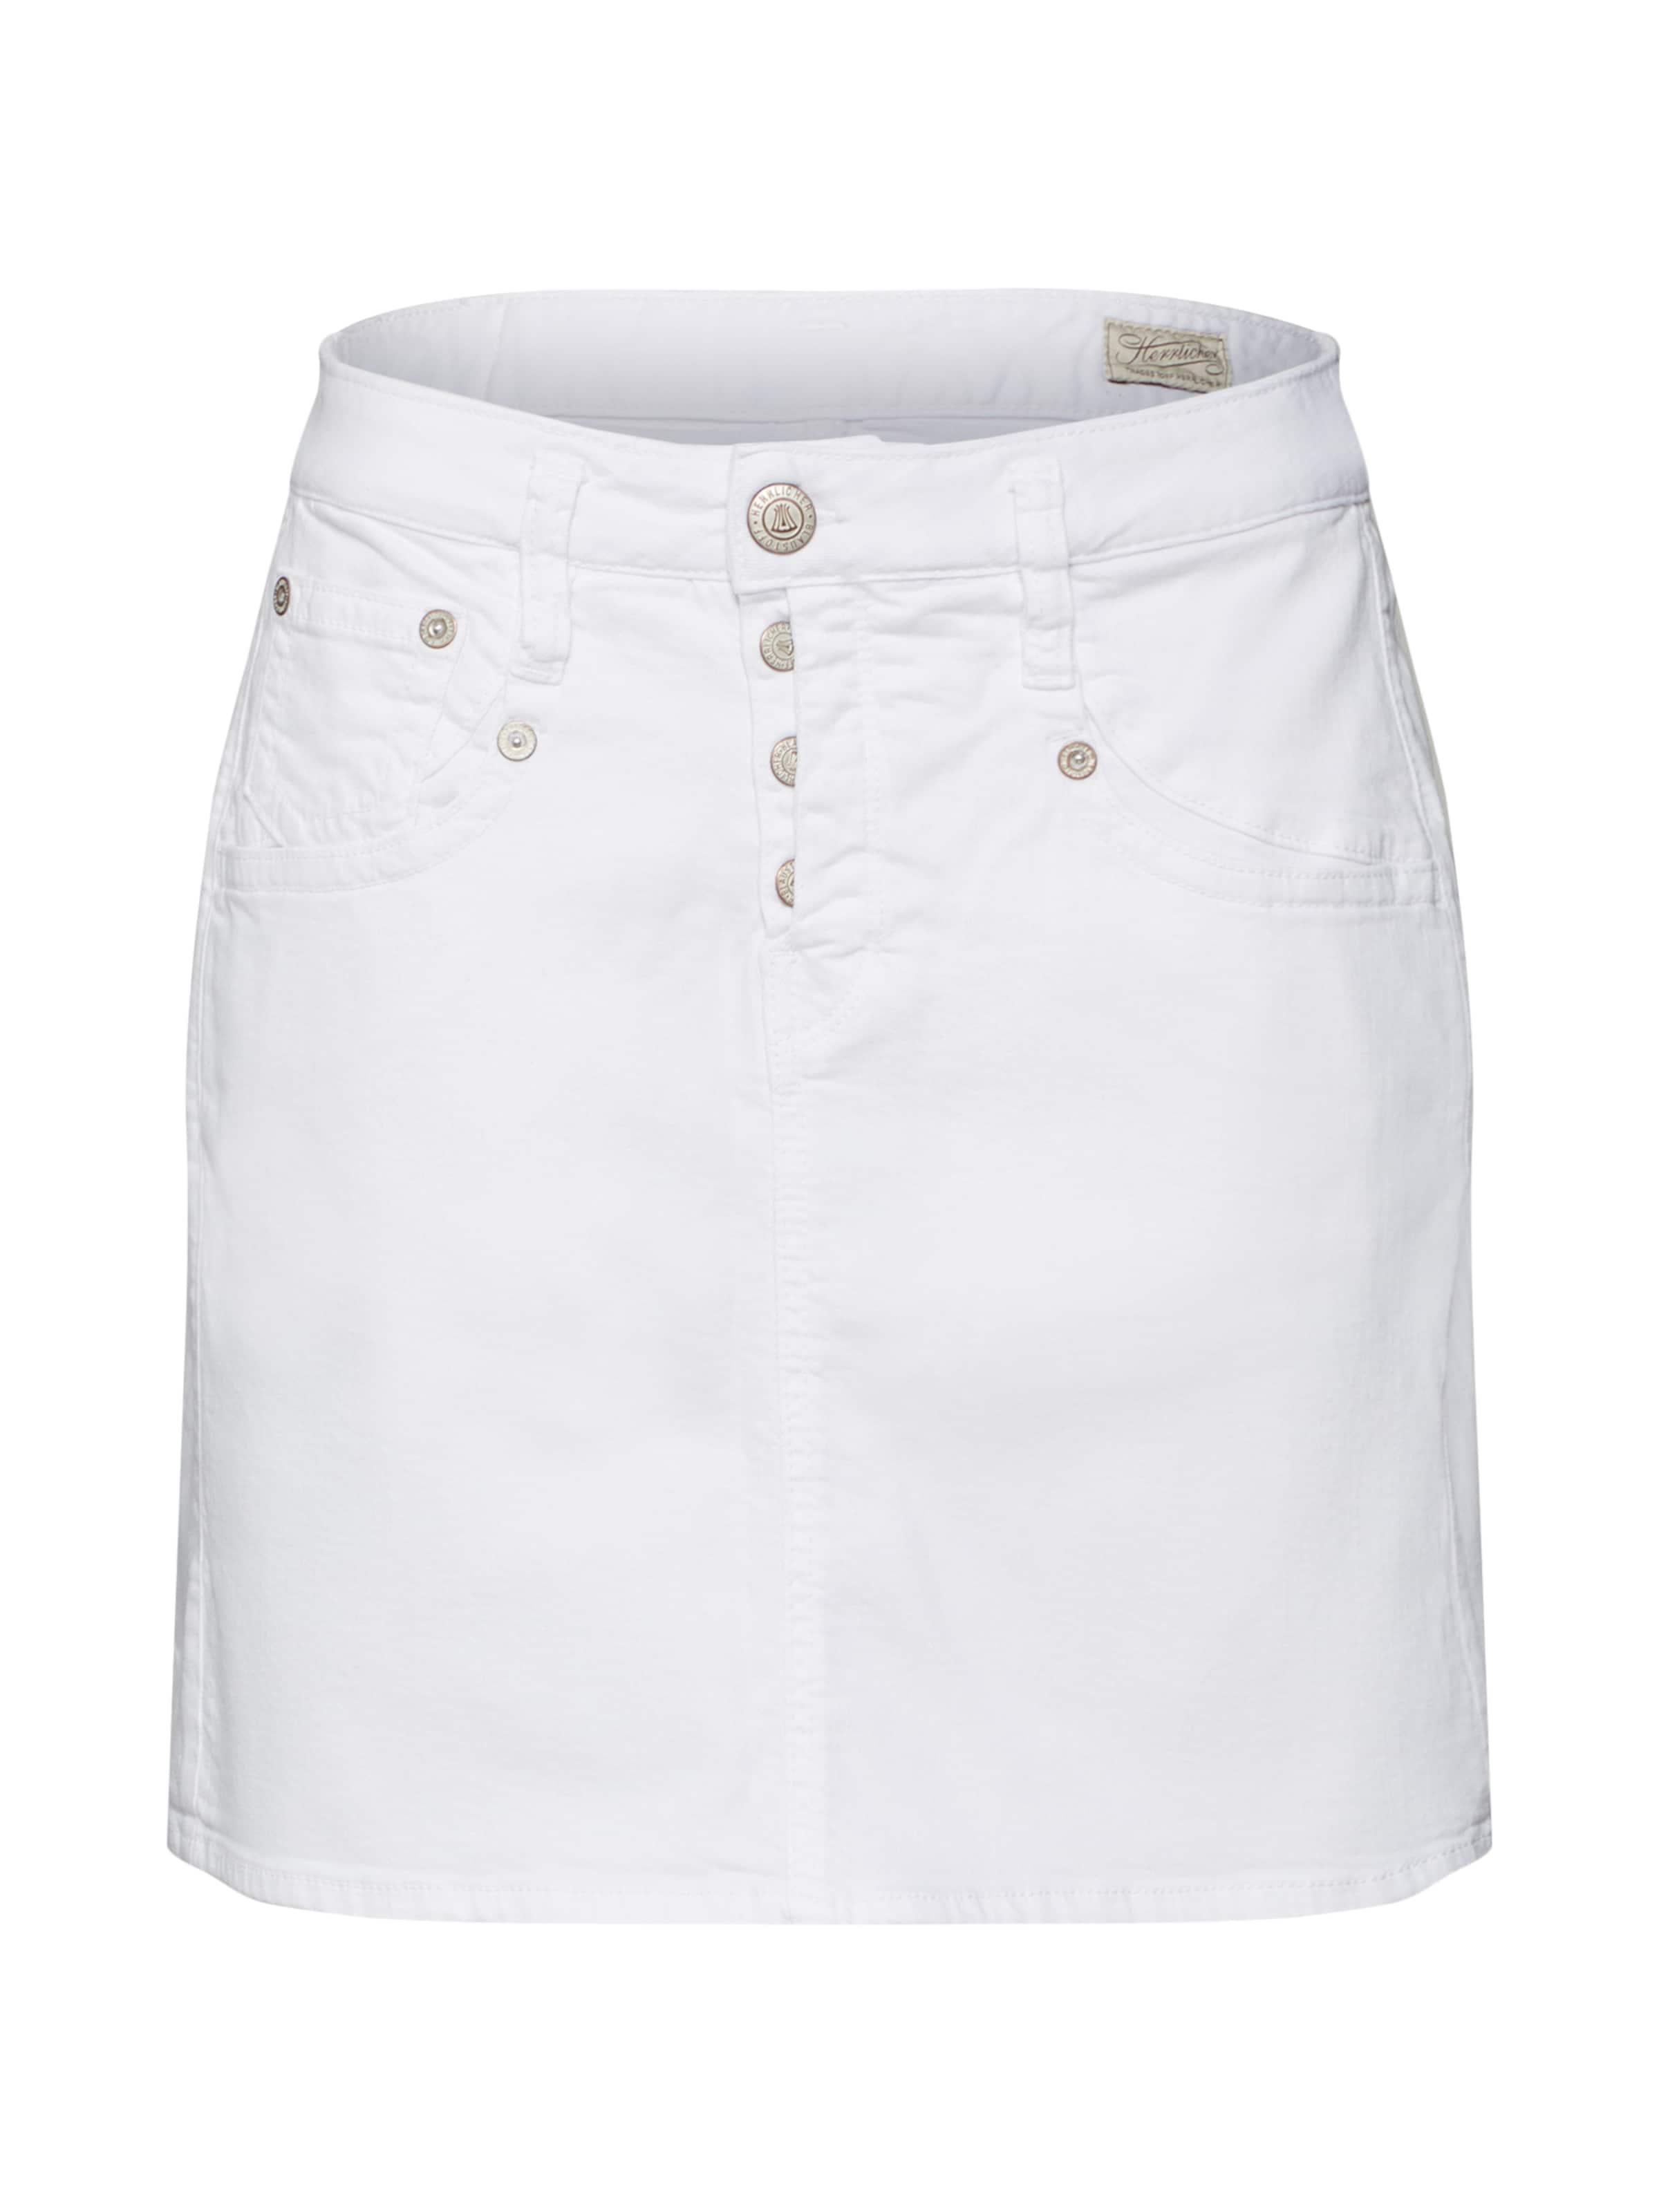 'shyra Skirt Drill Jupe Blanc Stretch' En Herrlicher EWDYIH29